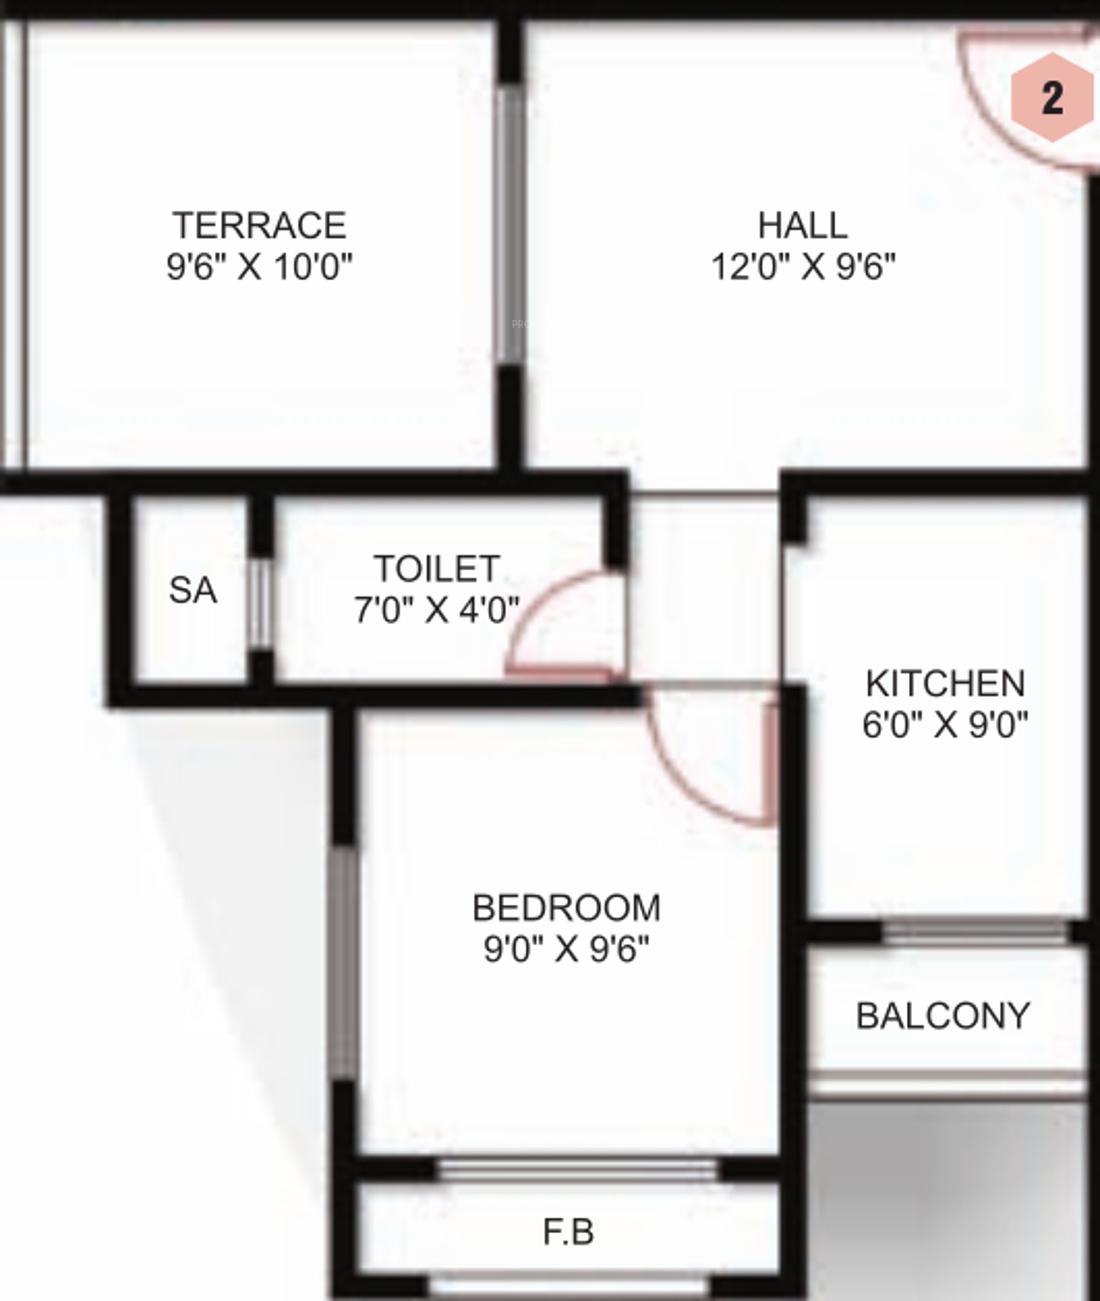 floor plan 1bhk 1t 450 sq ft free home design ideas images site plan office floor plan 450 sq ft office floor plan